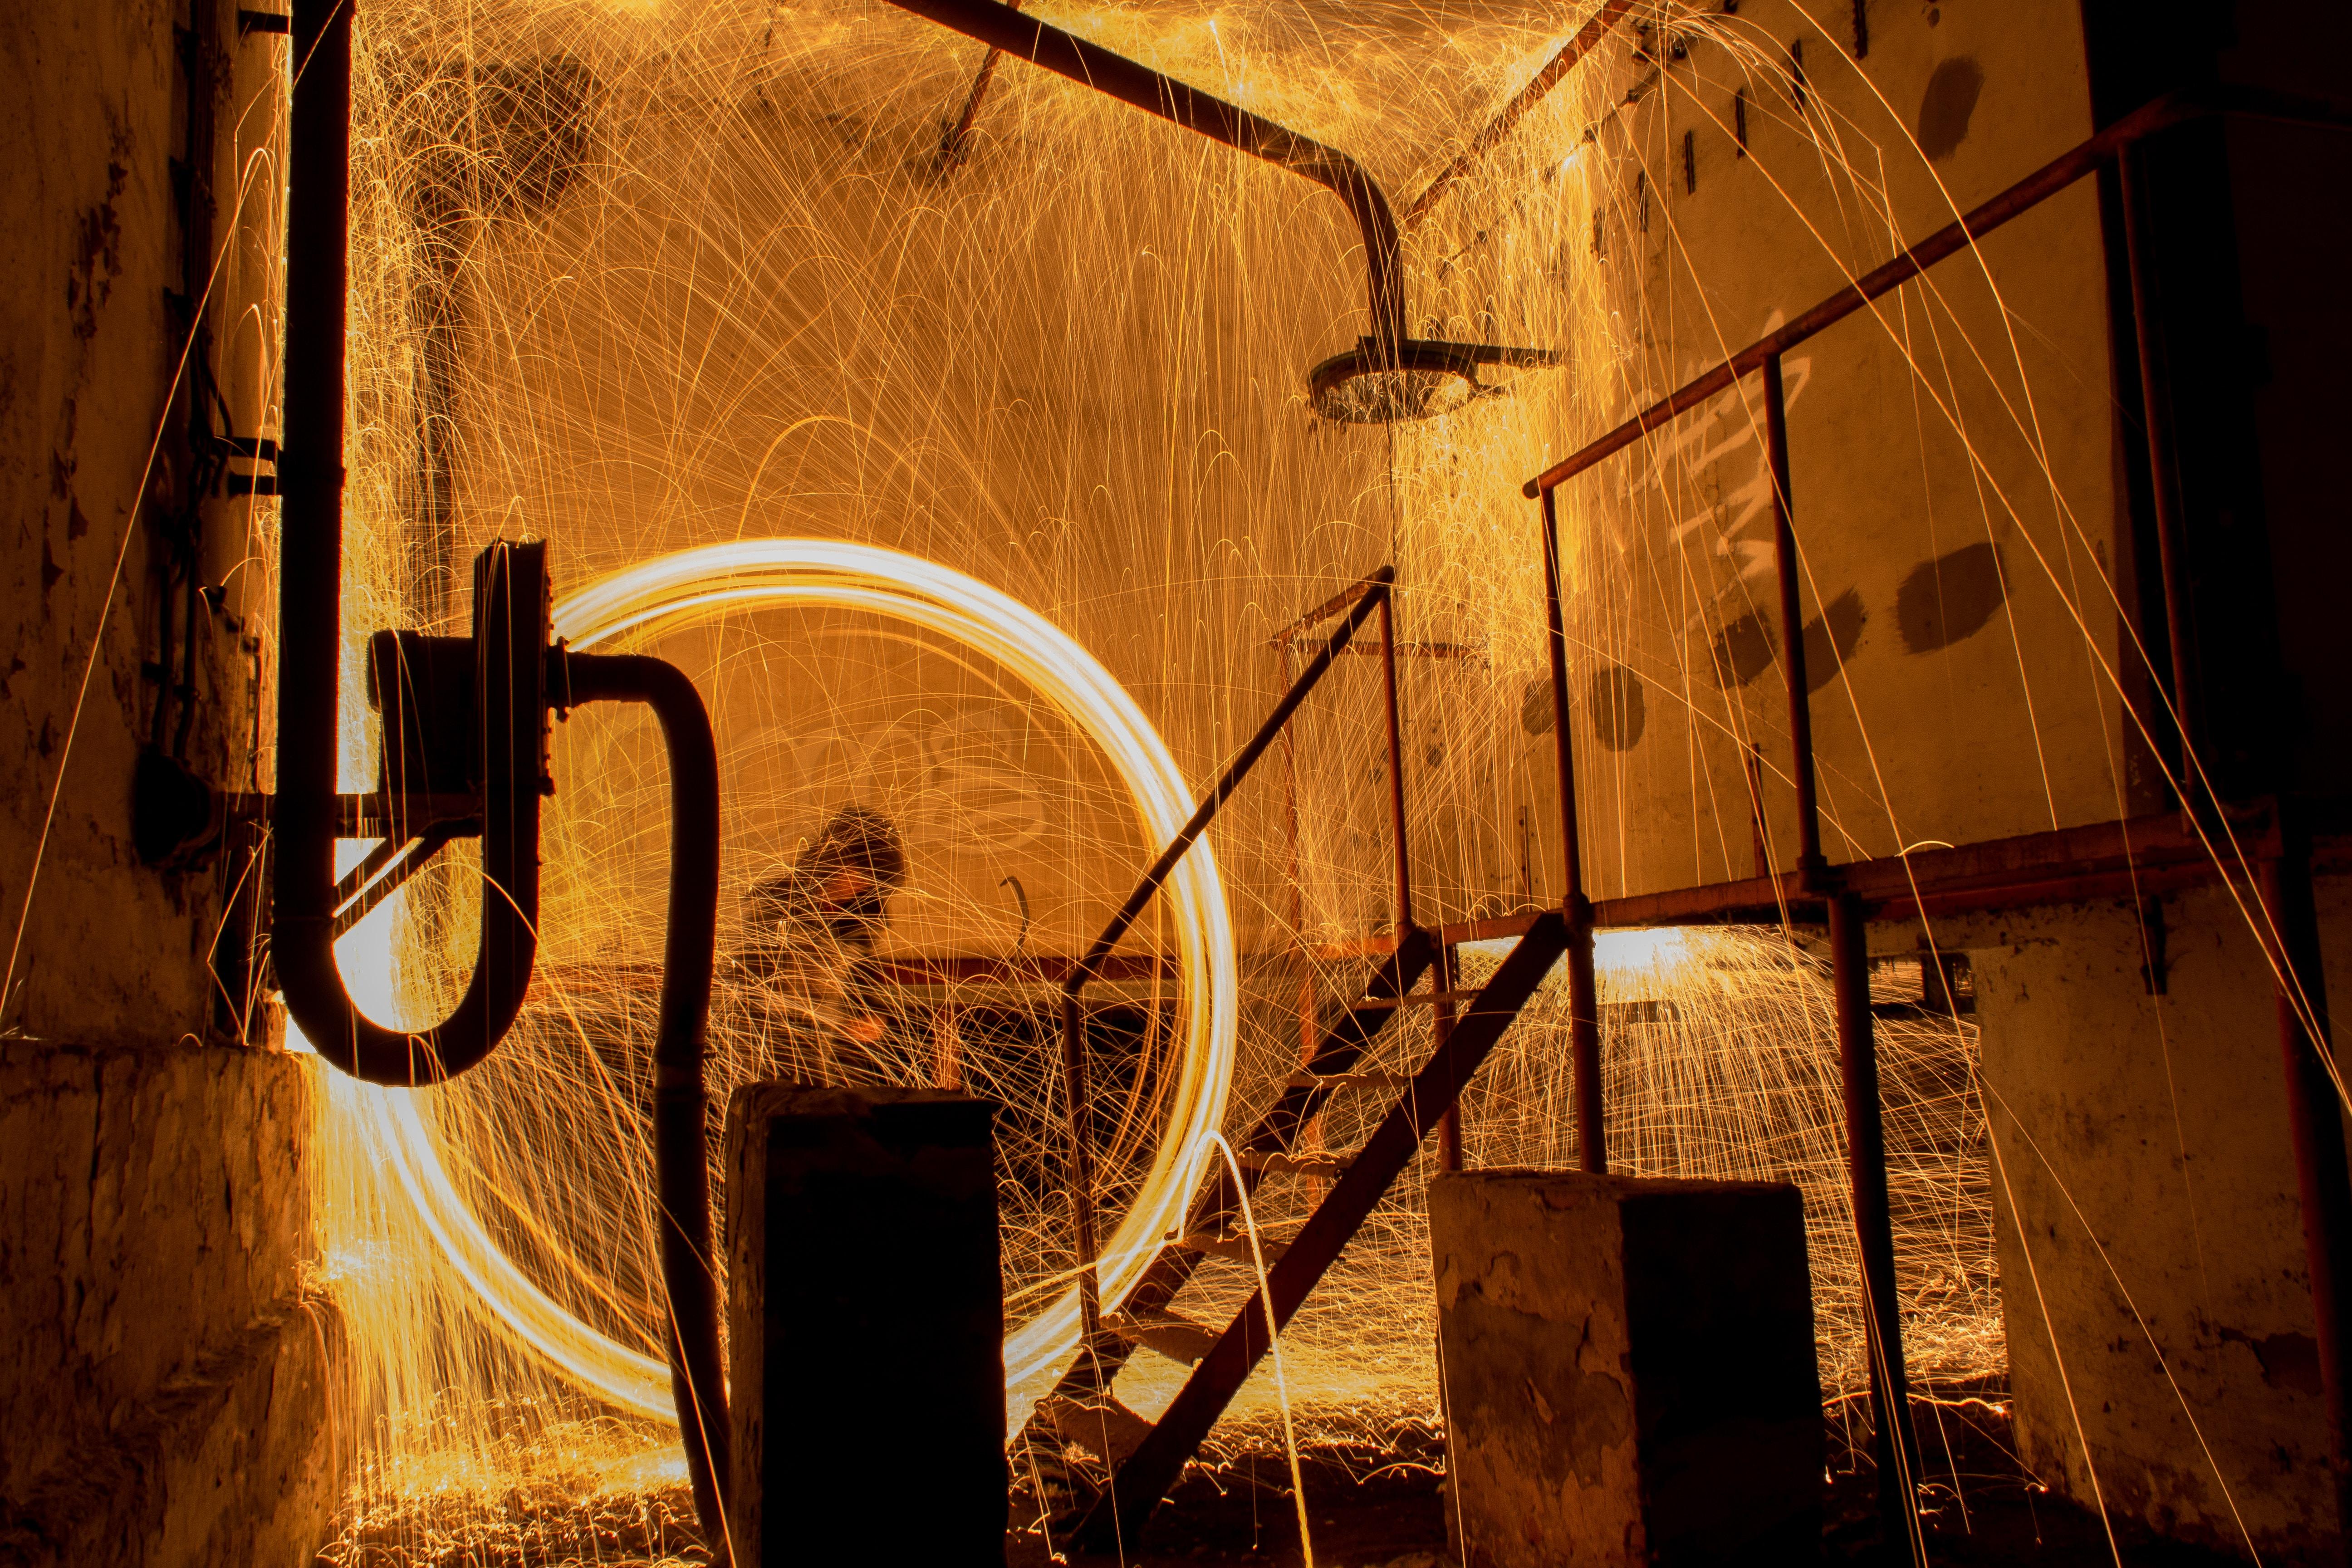 wheel fire dancing